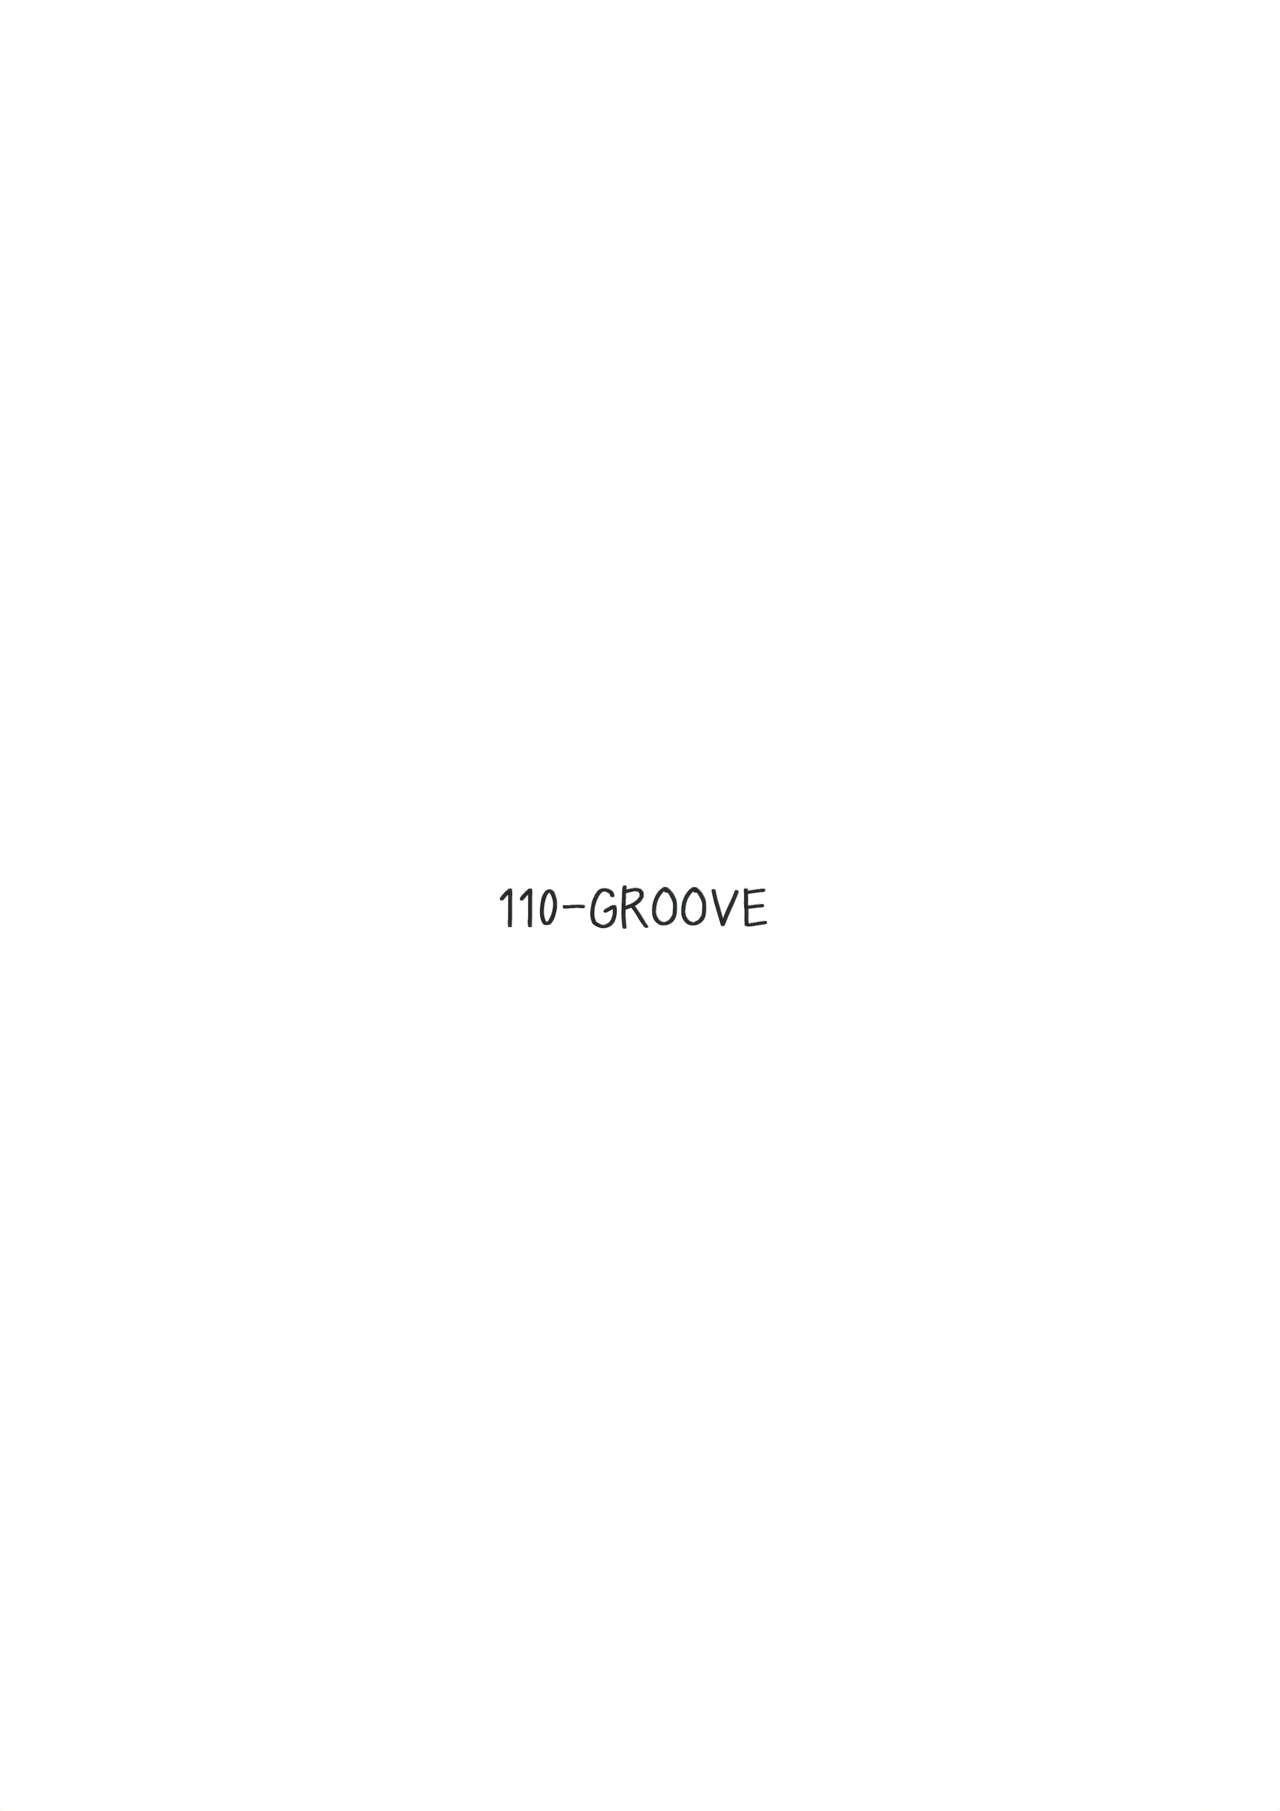 (C91) [110-GROOVE (Itou Yuuji)] Otoshigoro no Reimu-san to Marisa-san (Touhou Project) [English] [TreePerception] 21